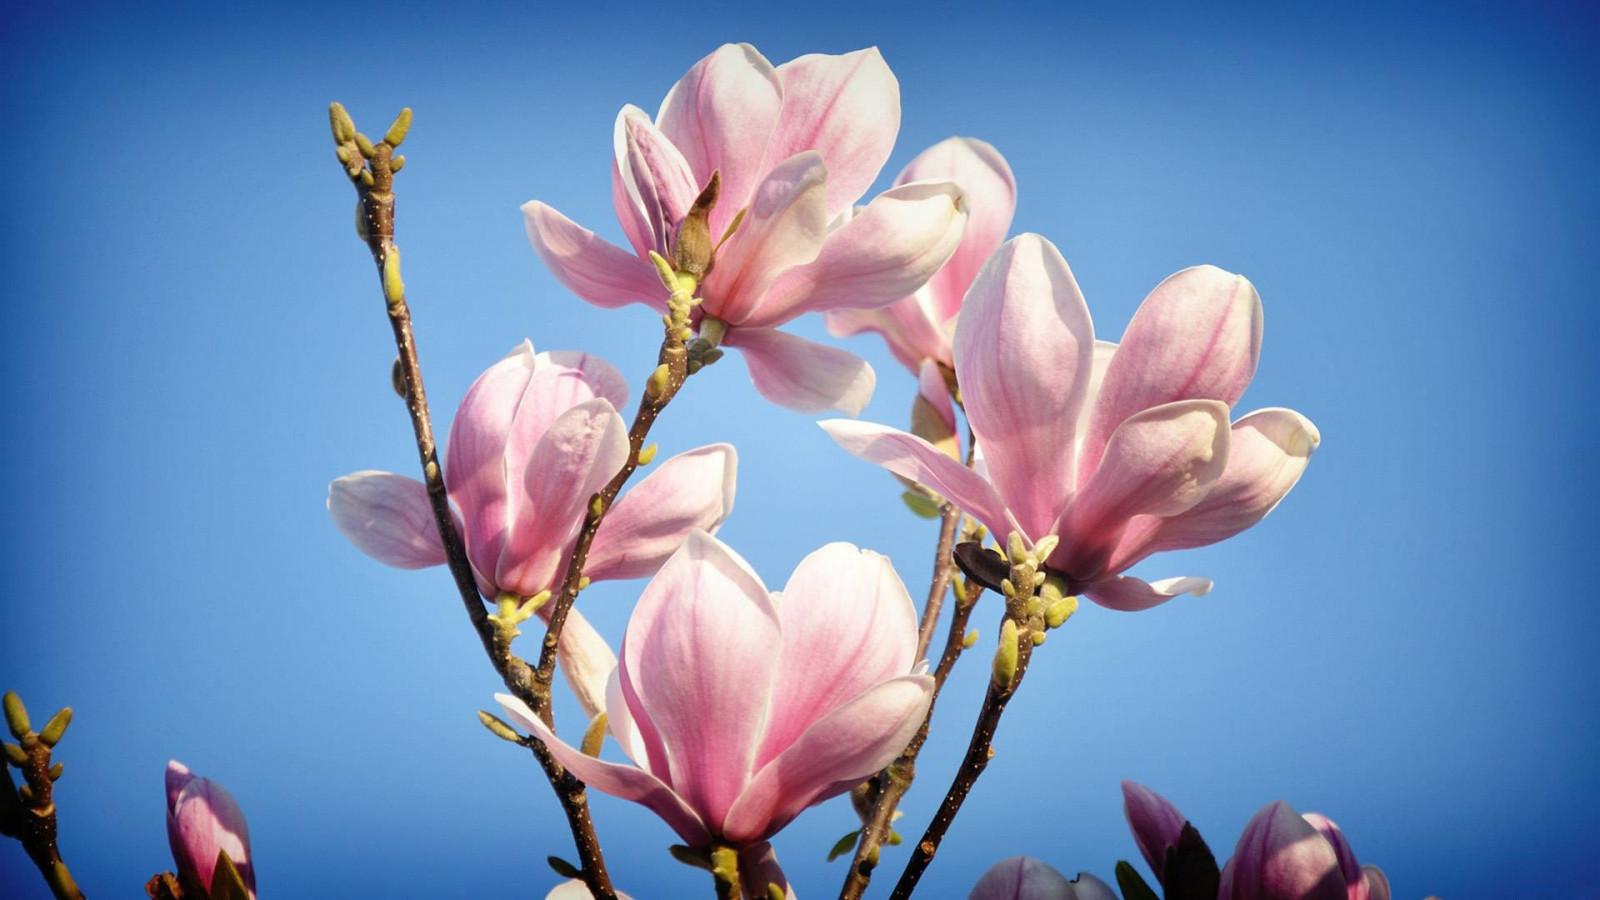 sky, blue, blossom, spring, magnolia, flower, plant, flora, branches, petal, botany, land plant, flowering plant, macro photography, magnolia family